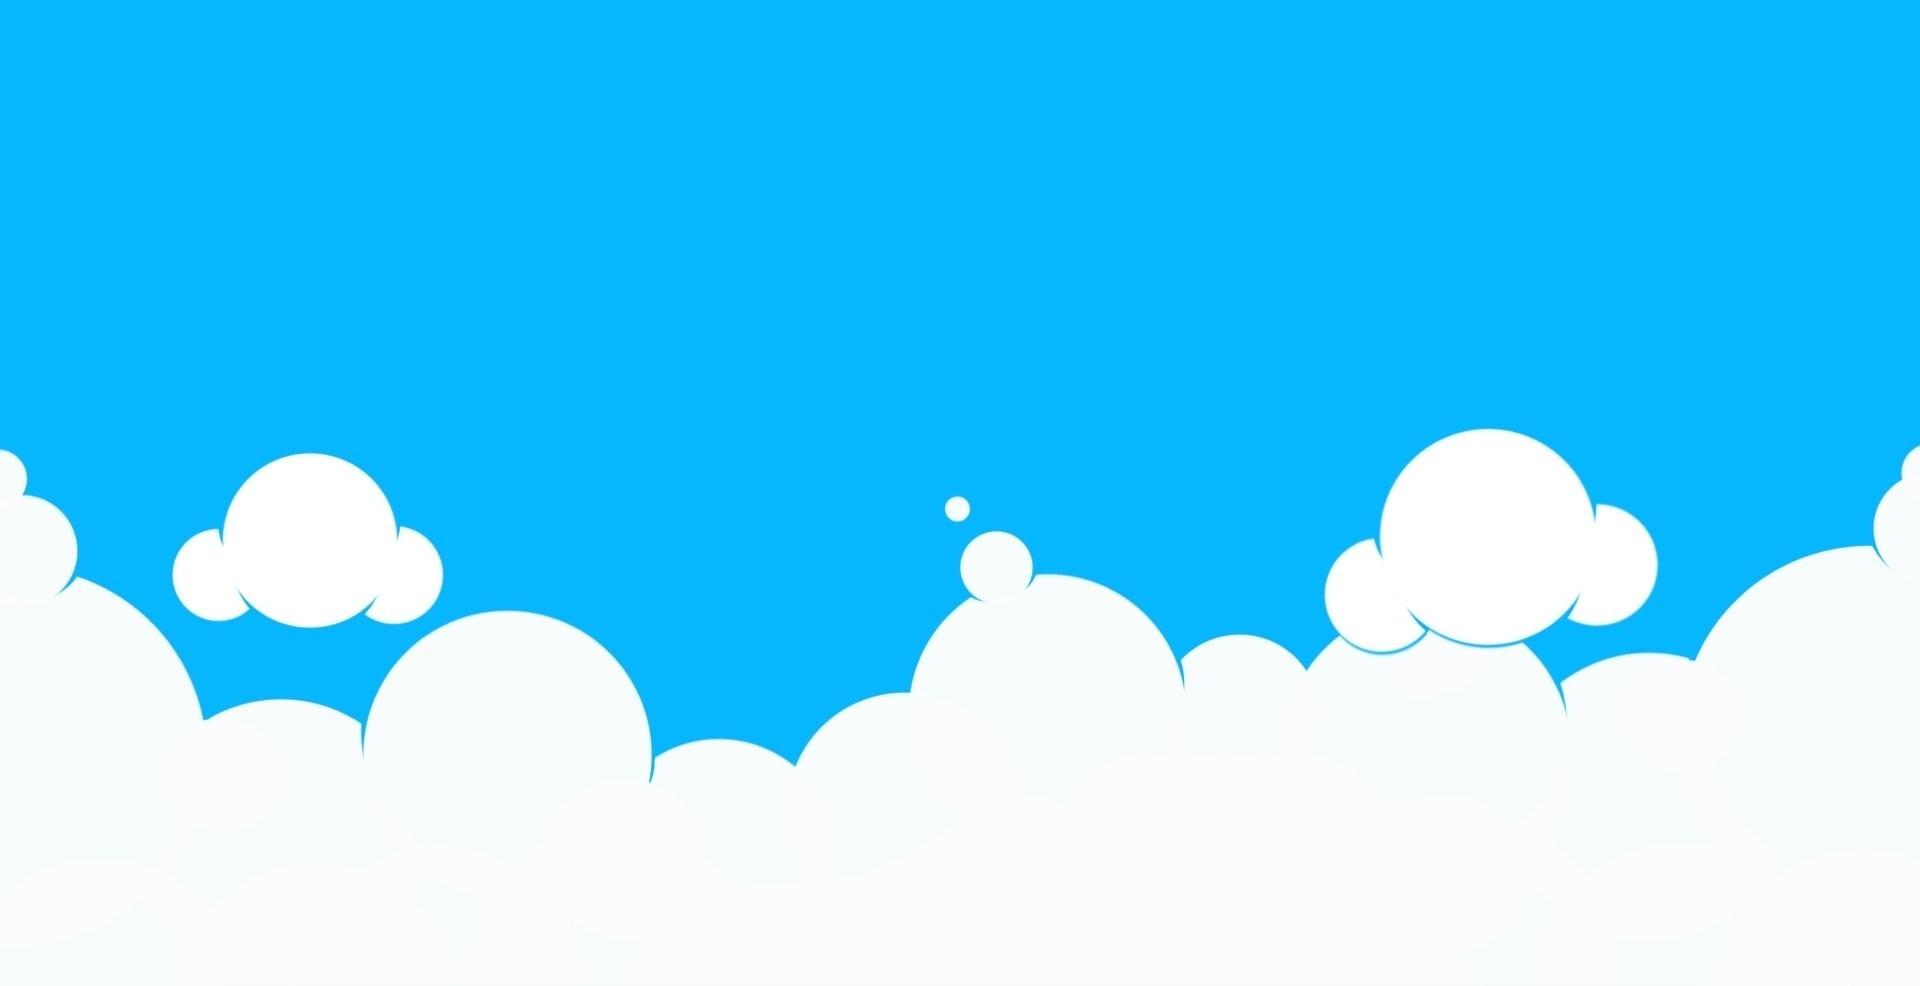 cloud clipart background - photo #16